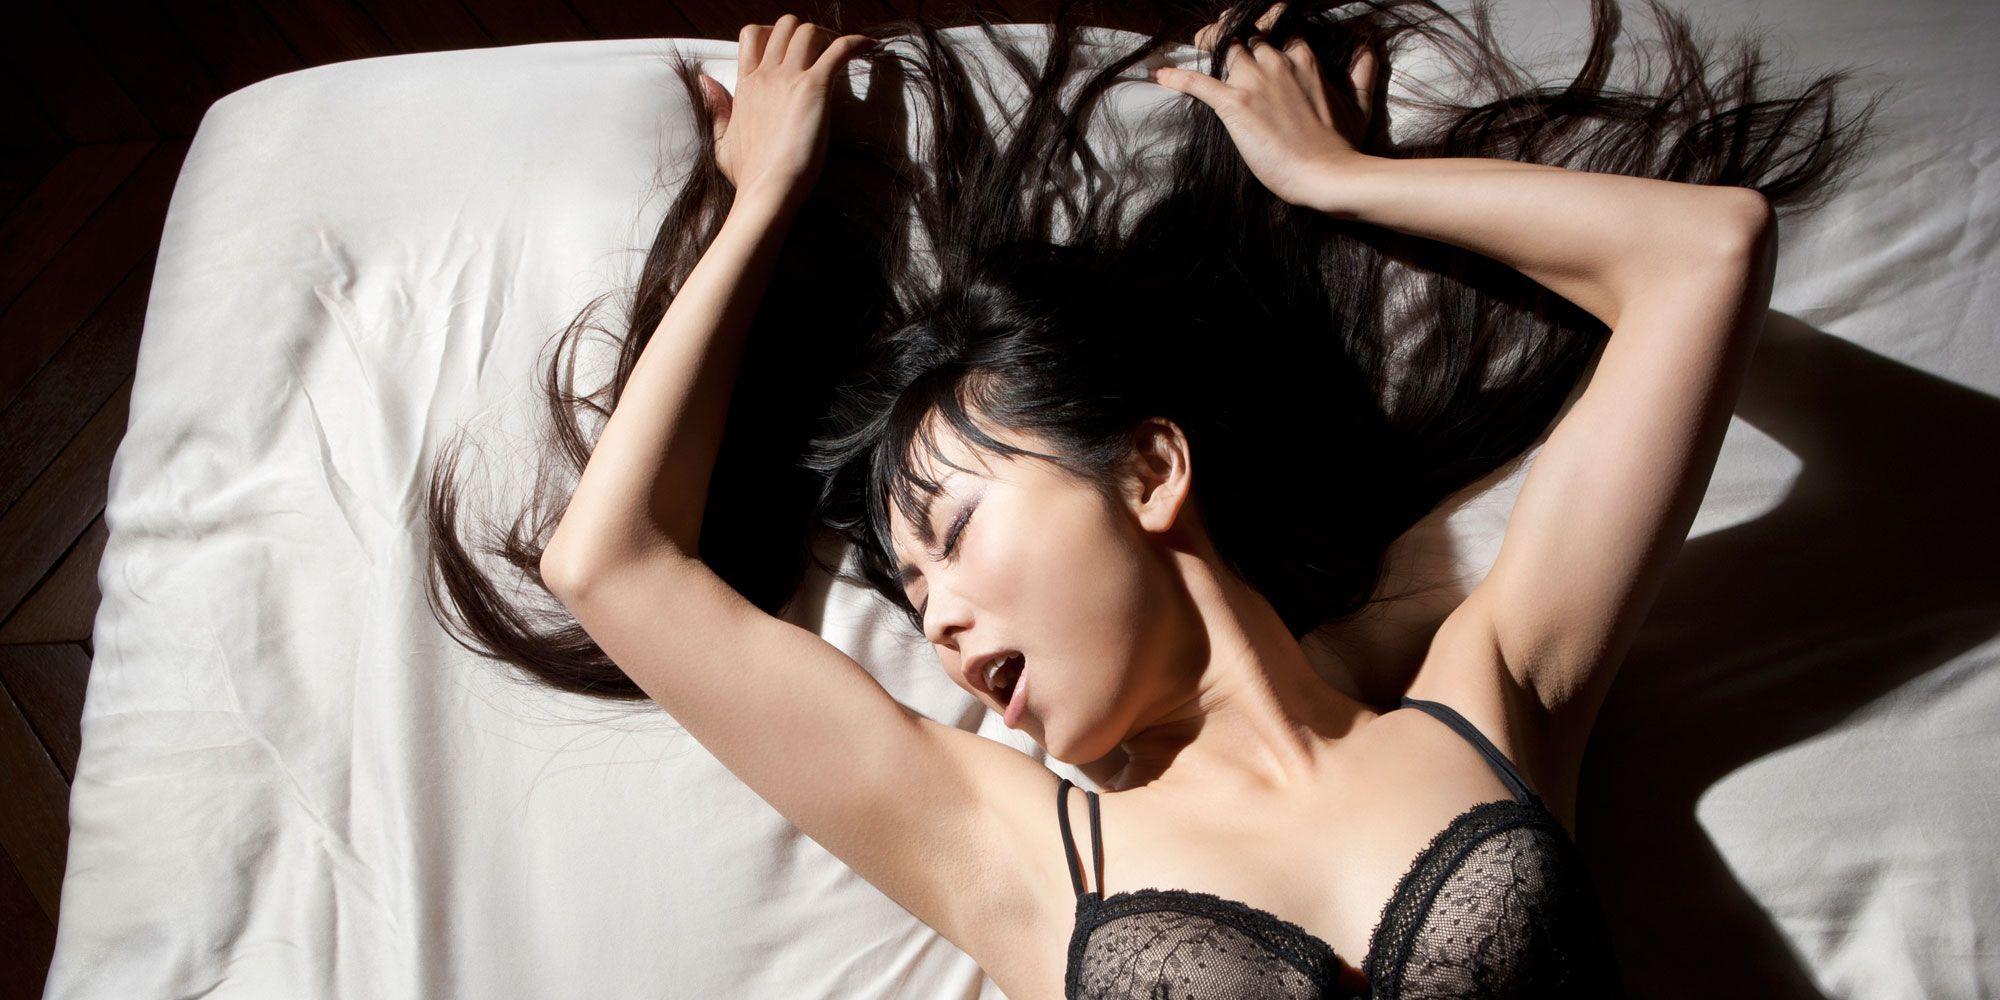 beste nackt sex videos